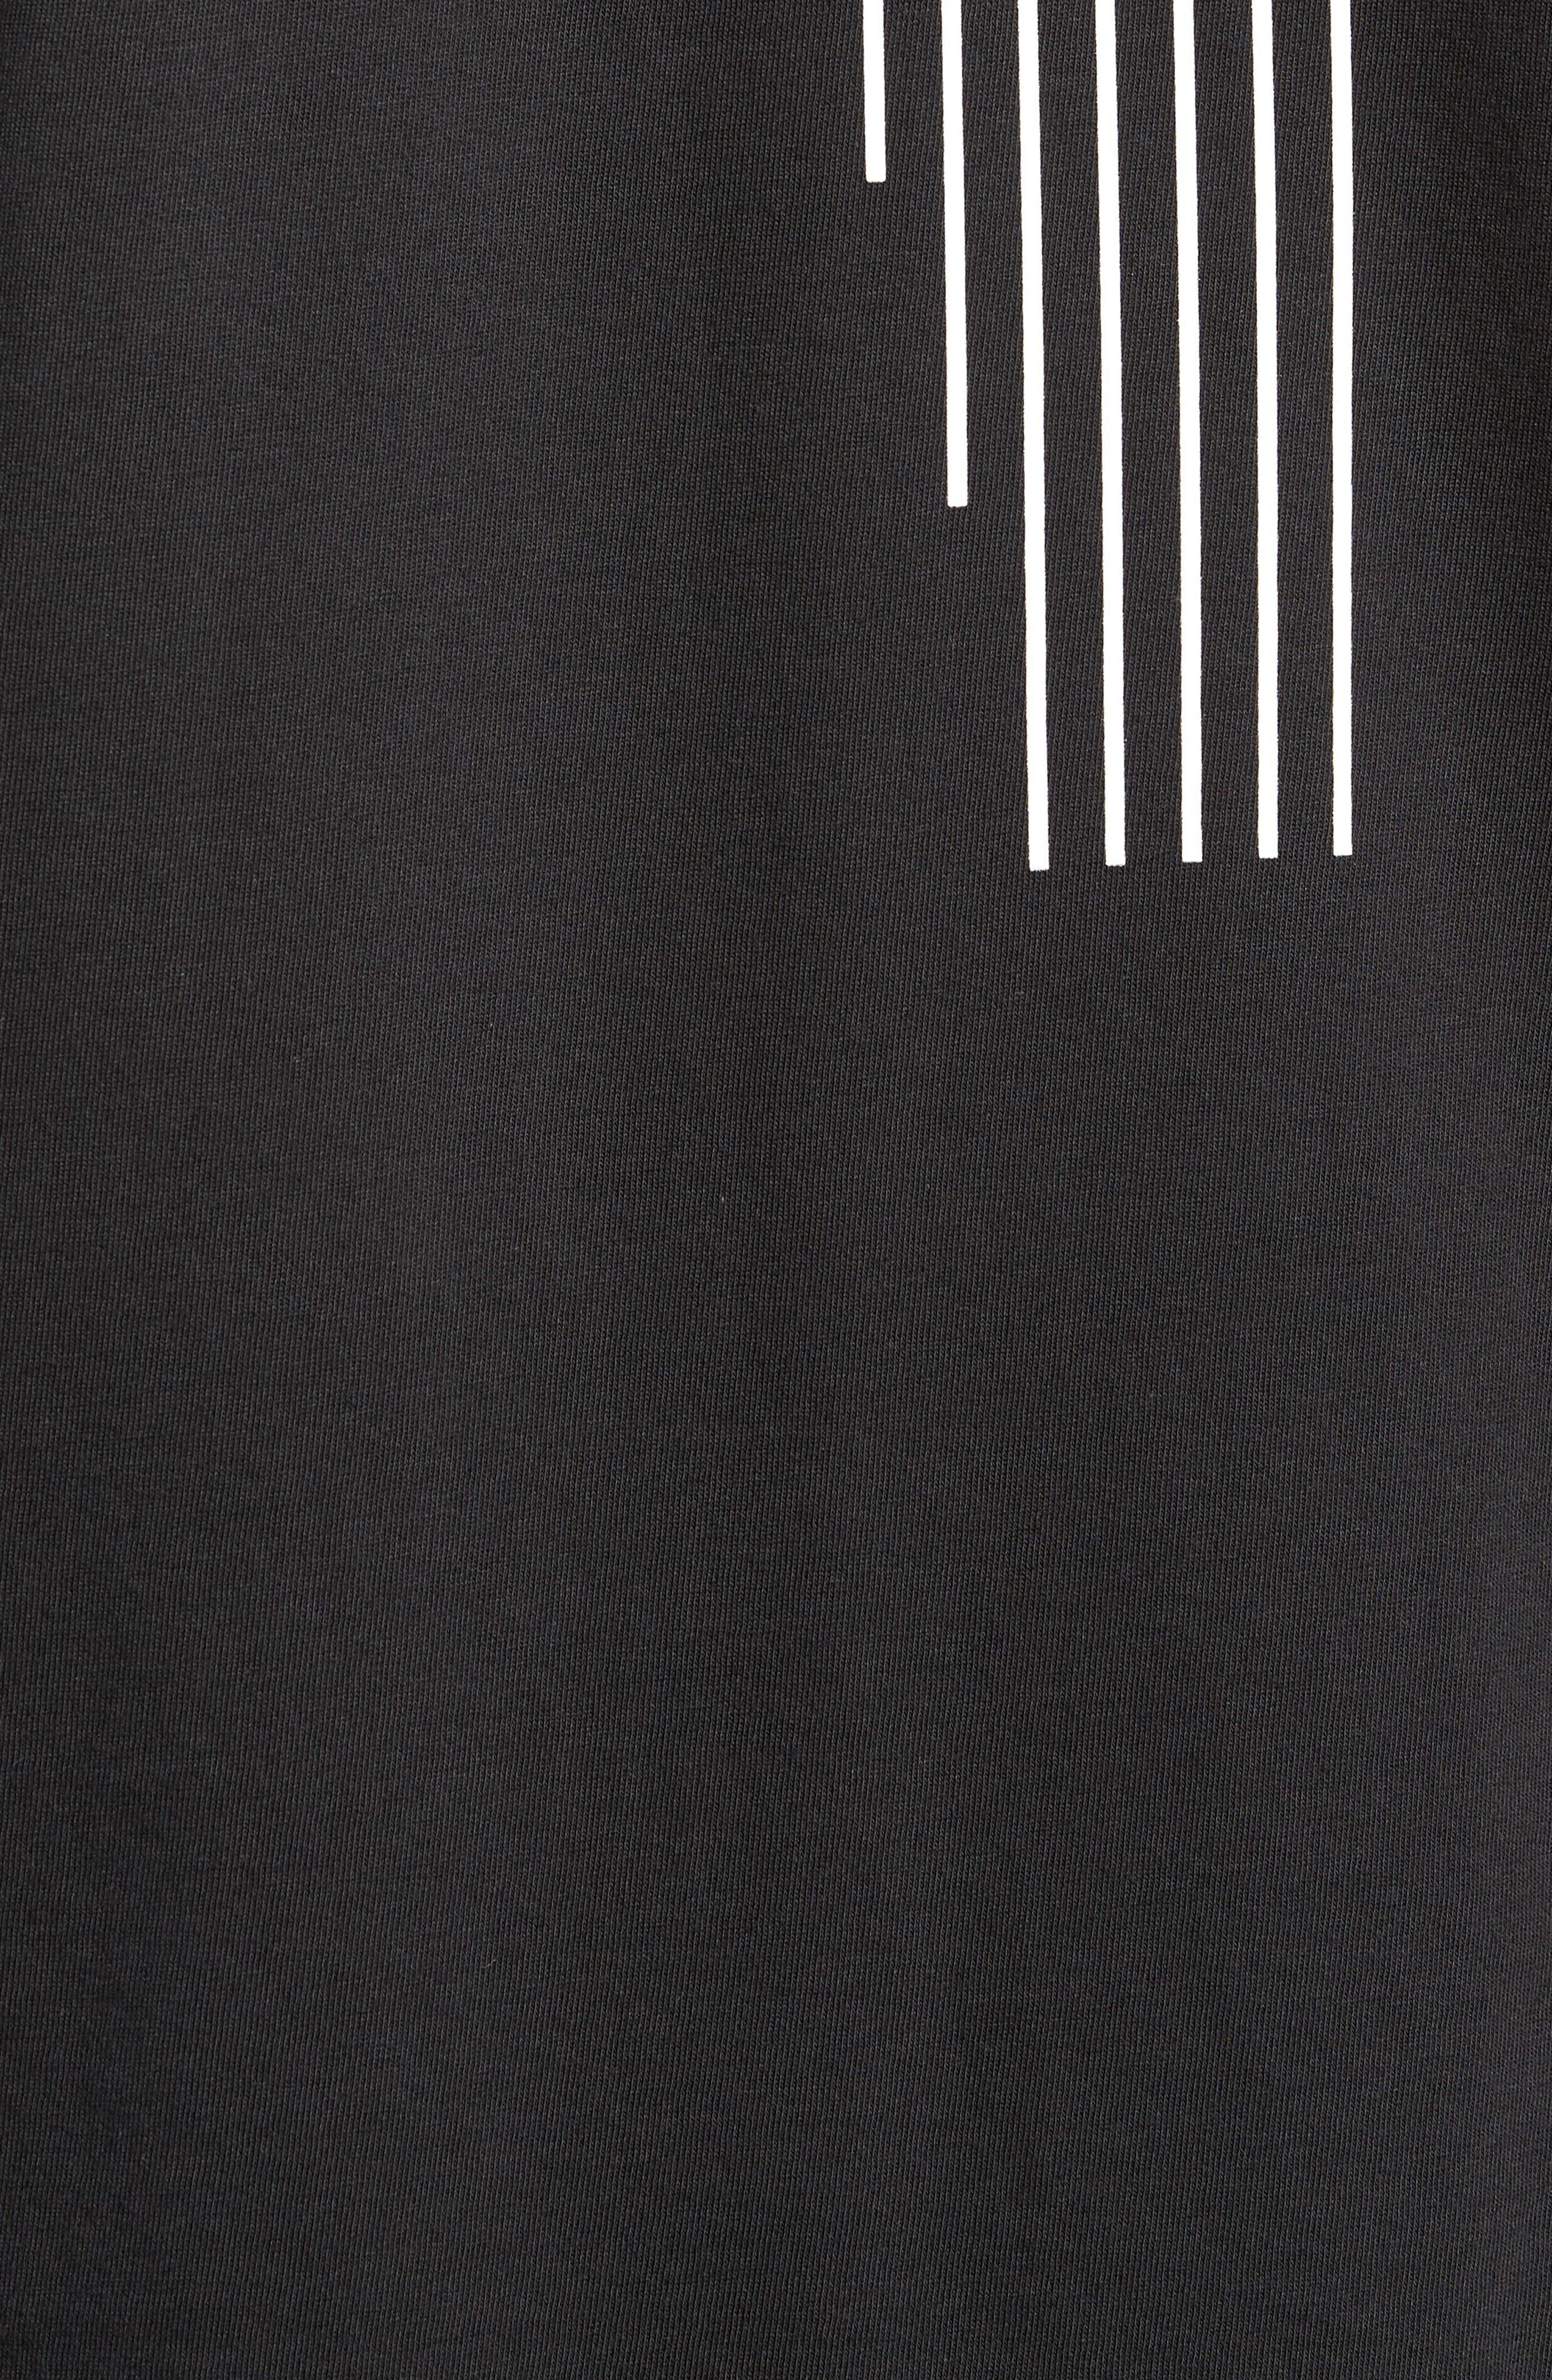 Rose Graphic T-Shirt,                             Alternate thumbnail 5, color,                             Black